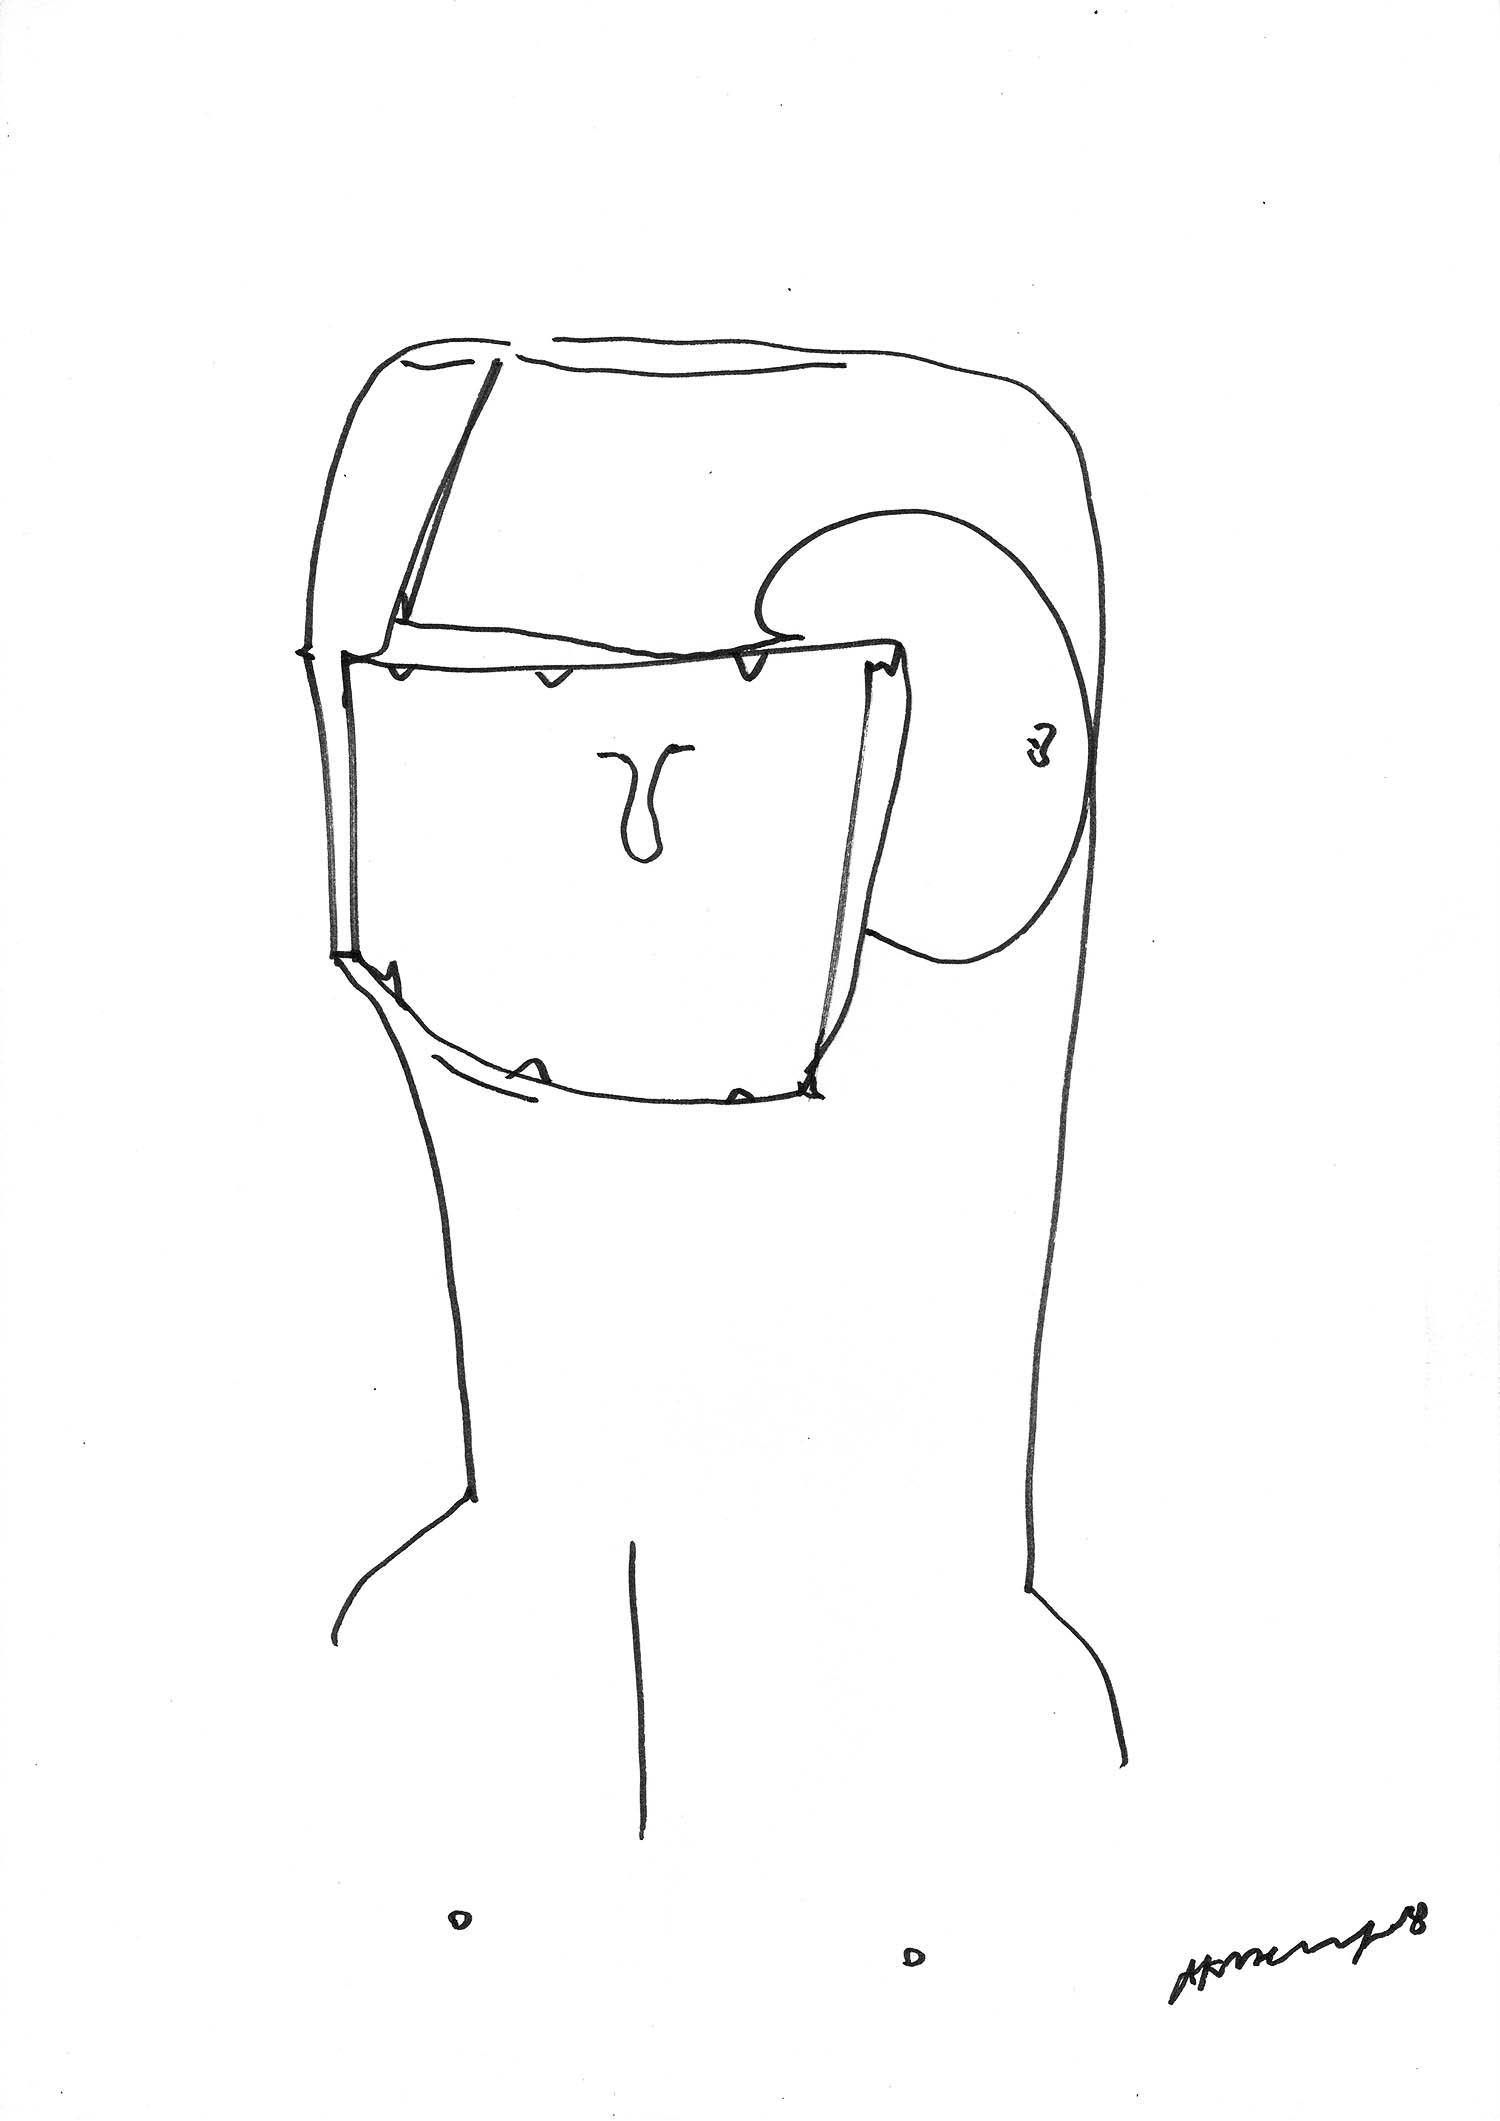 Blind Speaker (The Campaign) by greek multidisciplinary artist Kostas Gogas